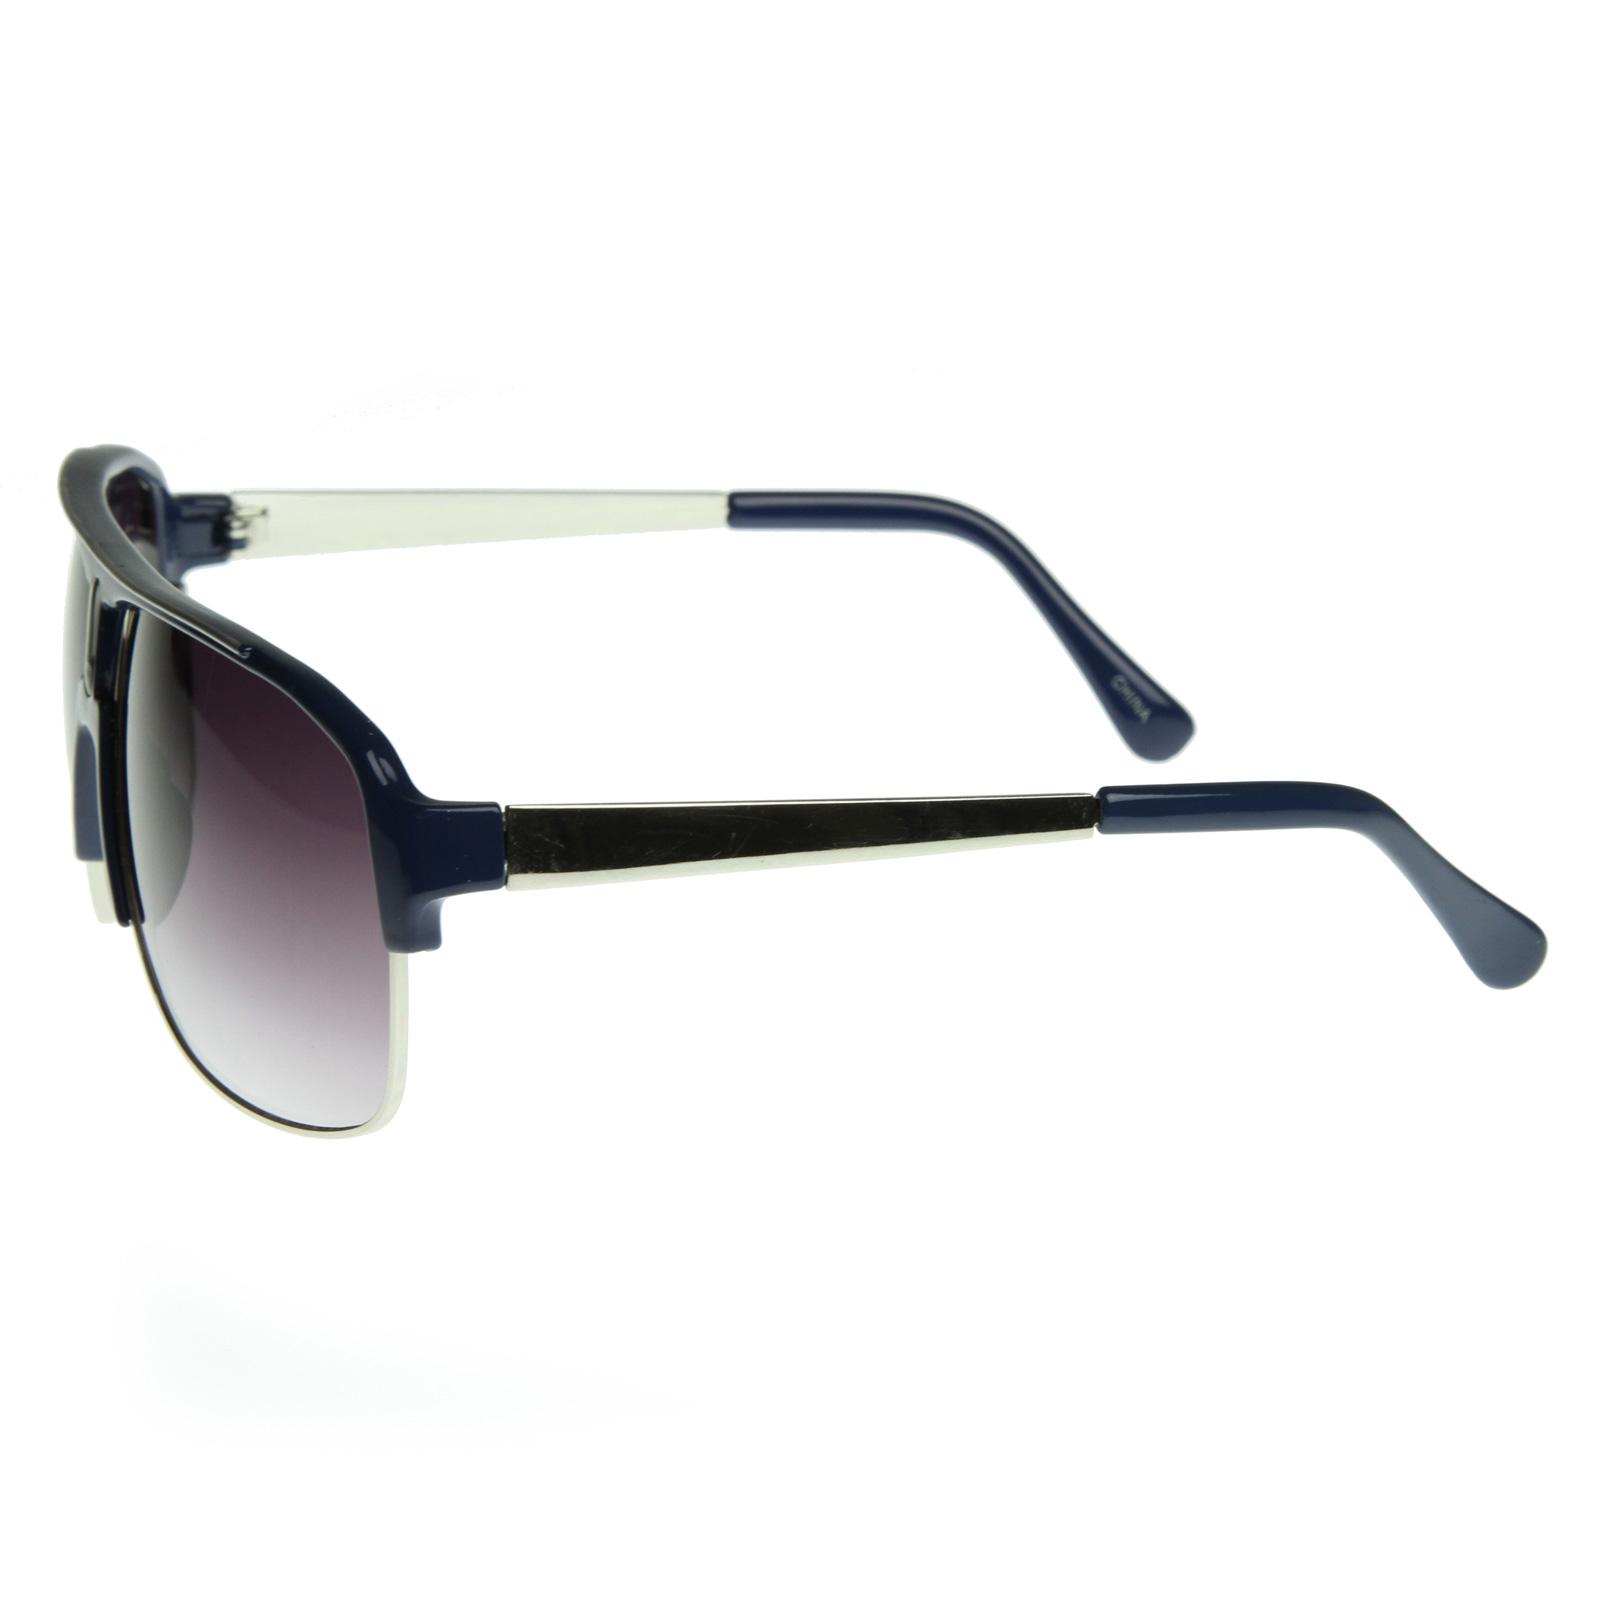 Big Frame Aviator Glasses : European Inspired Large Clubmaster Half Frame 80s Style ...